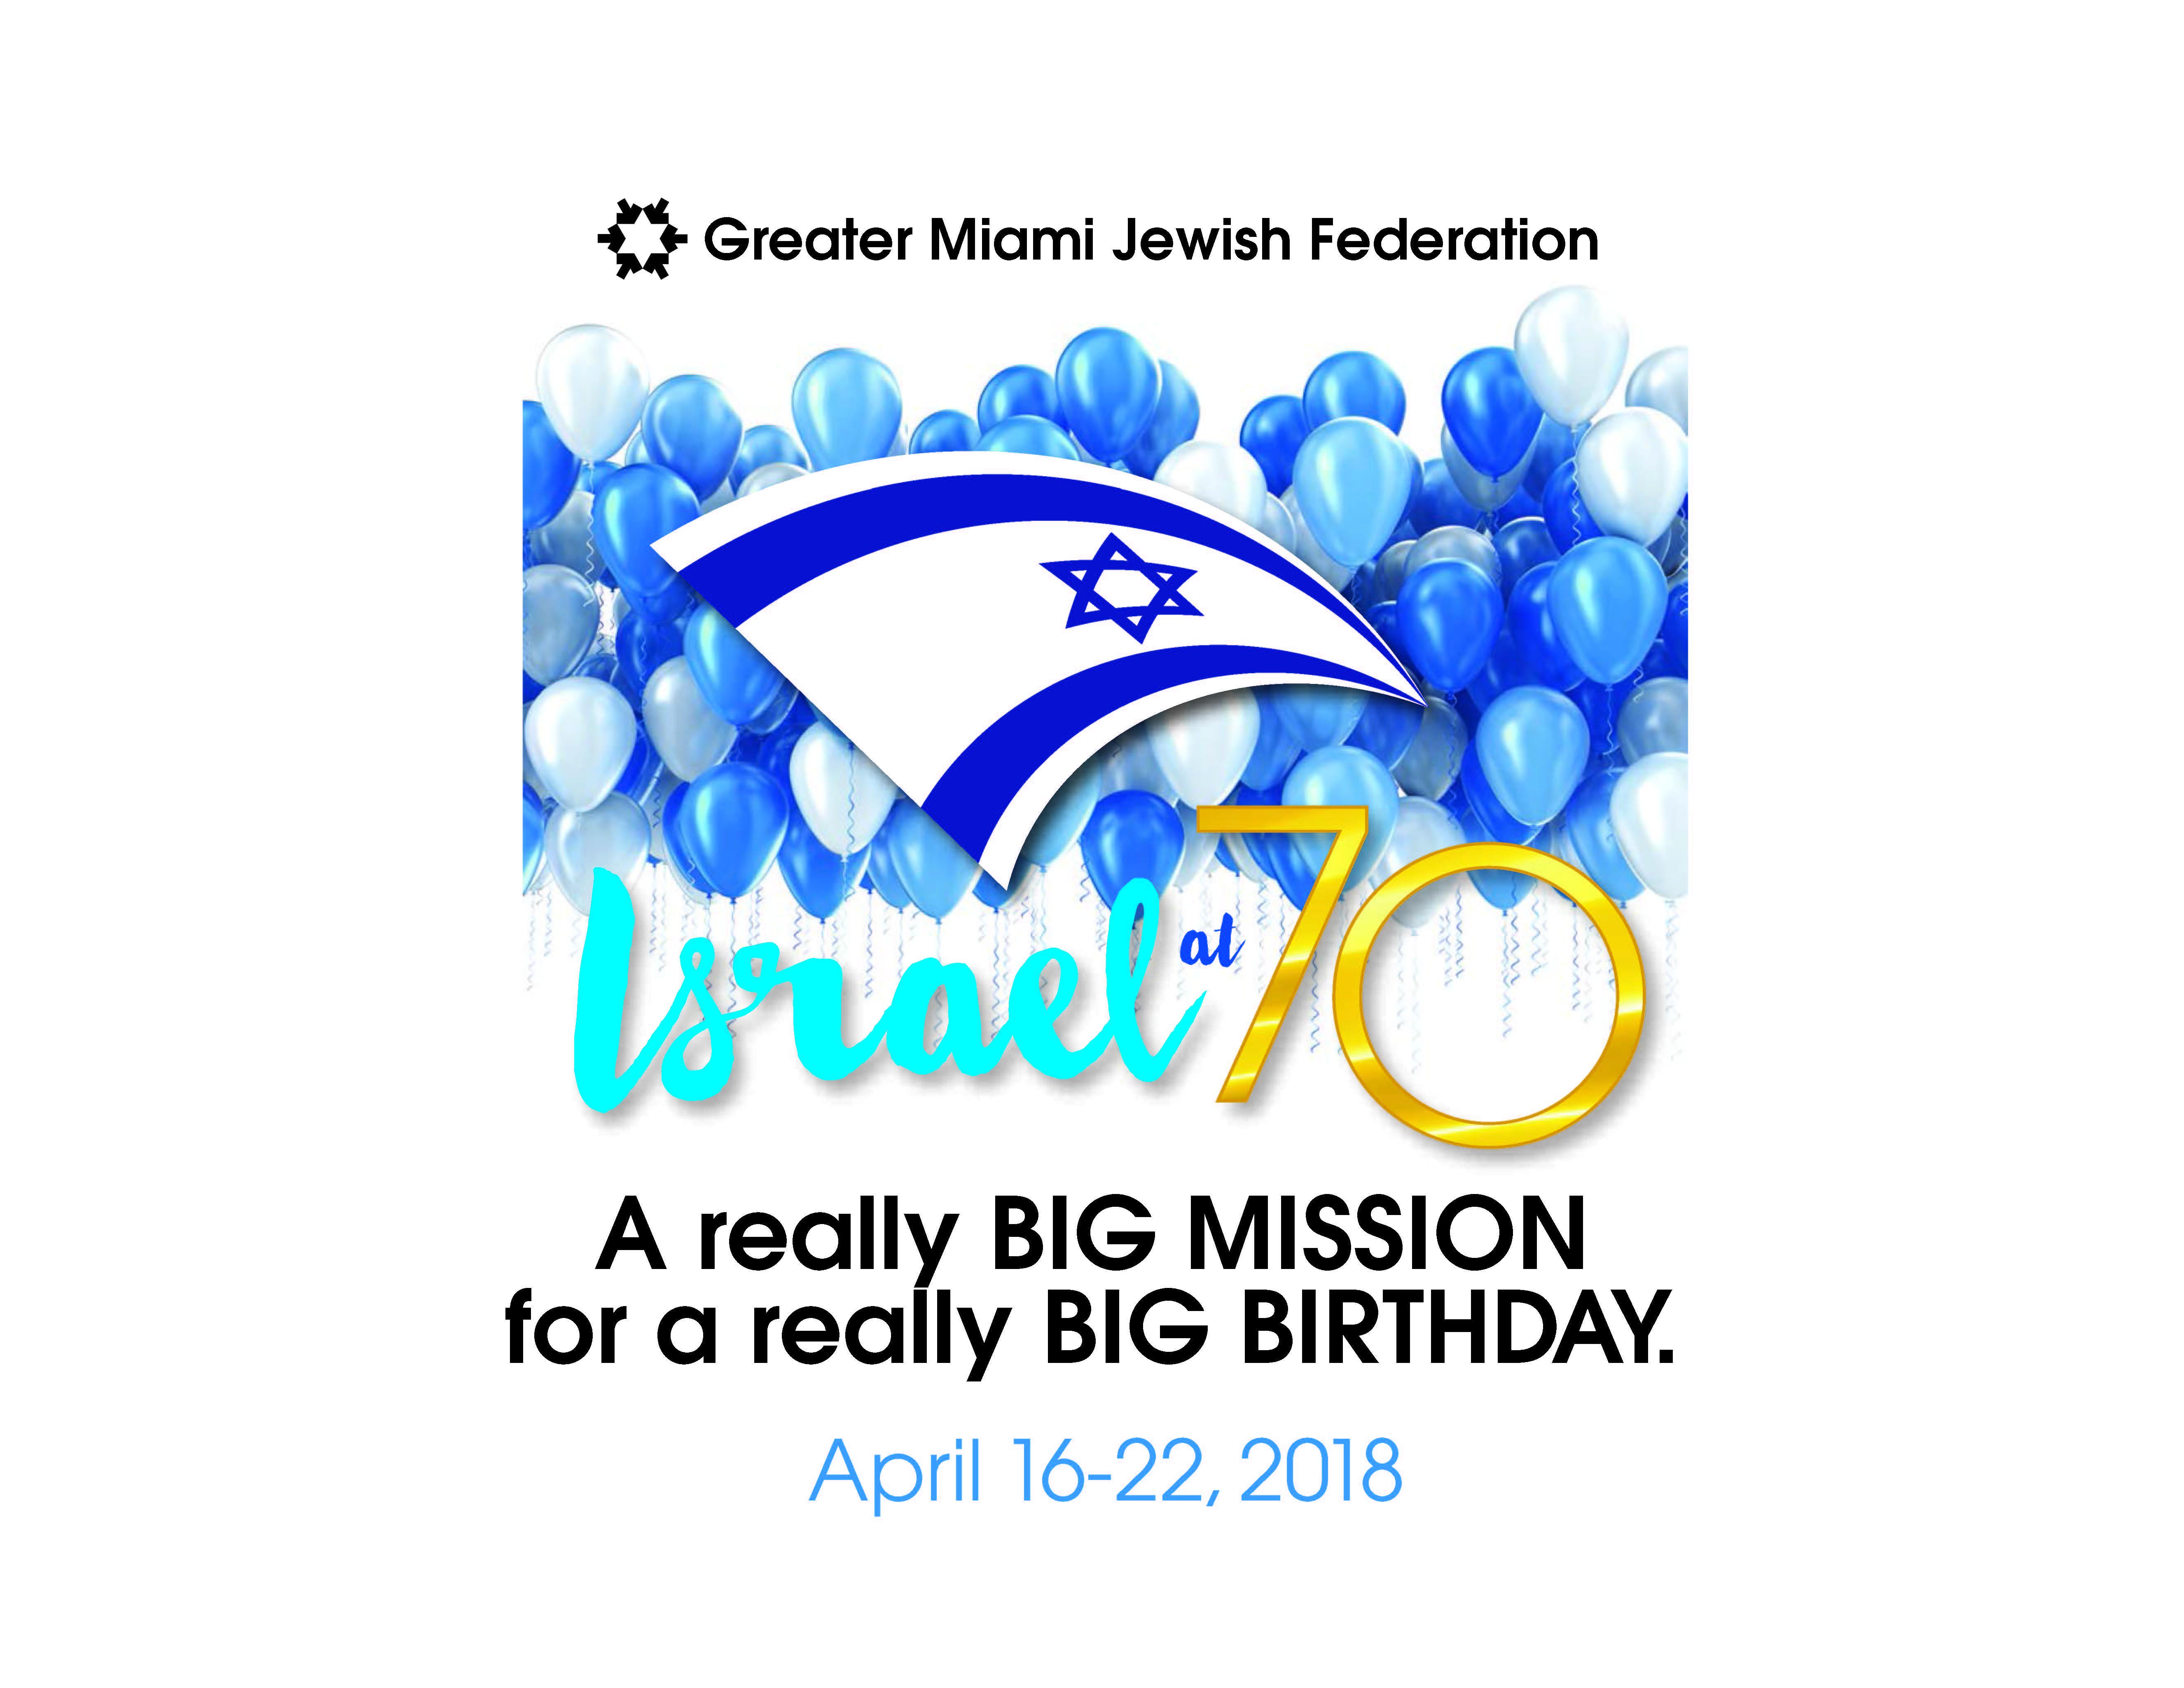 Israel at 70 Mission